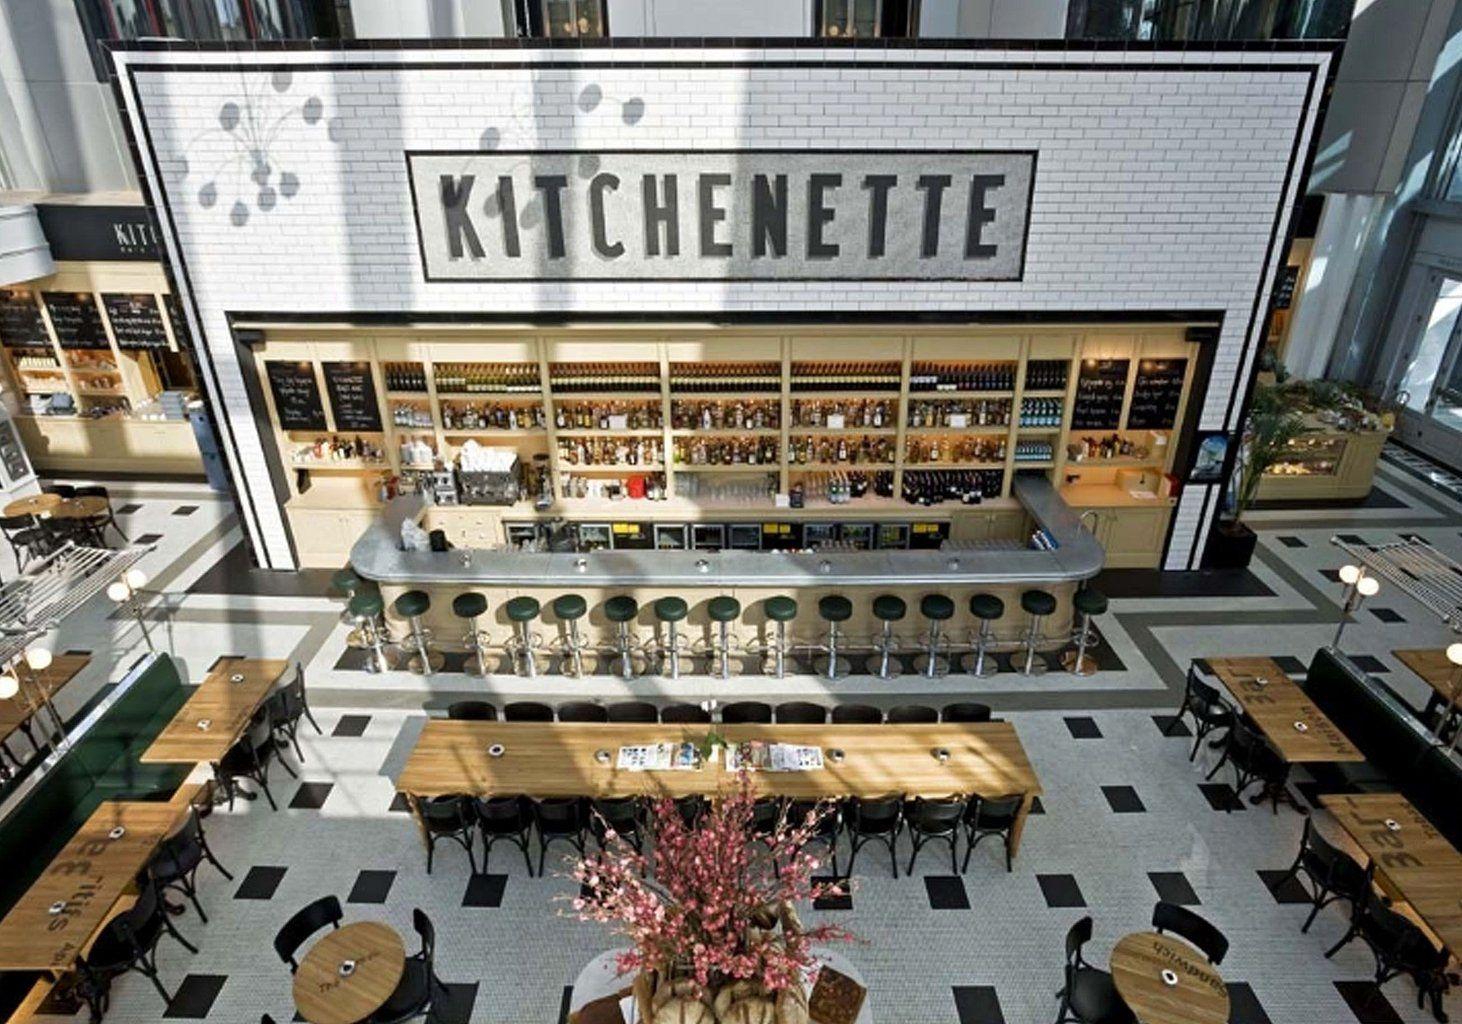 Pin By Hashim Afzal On Restrurent Bar Design Restaurant Bar Design Food Court Design